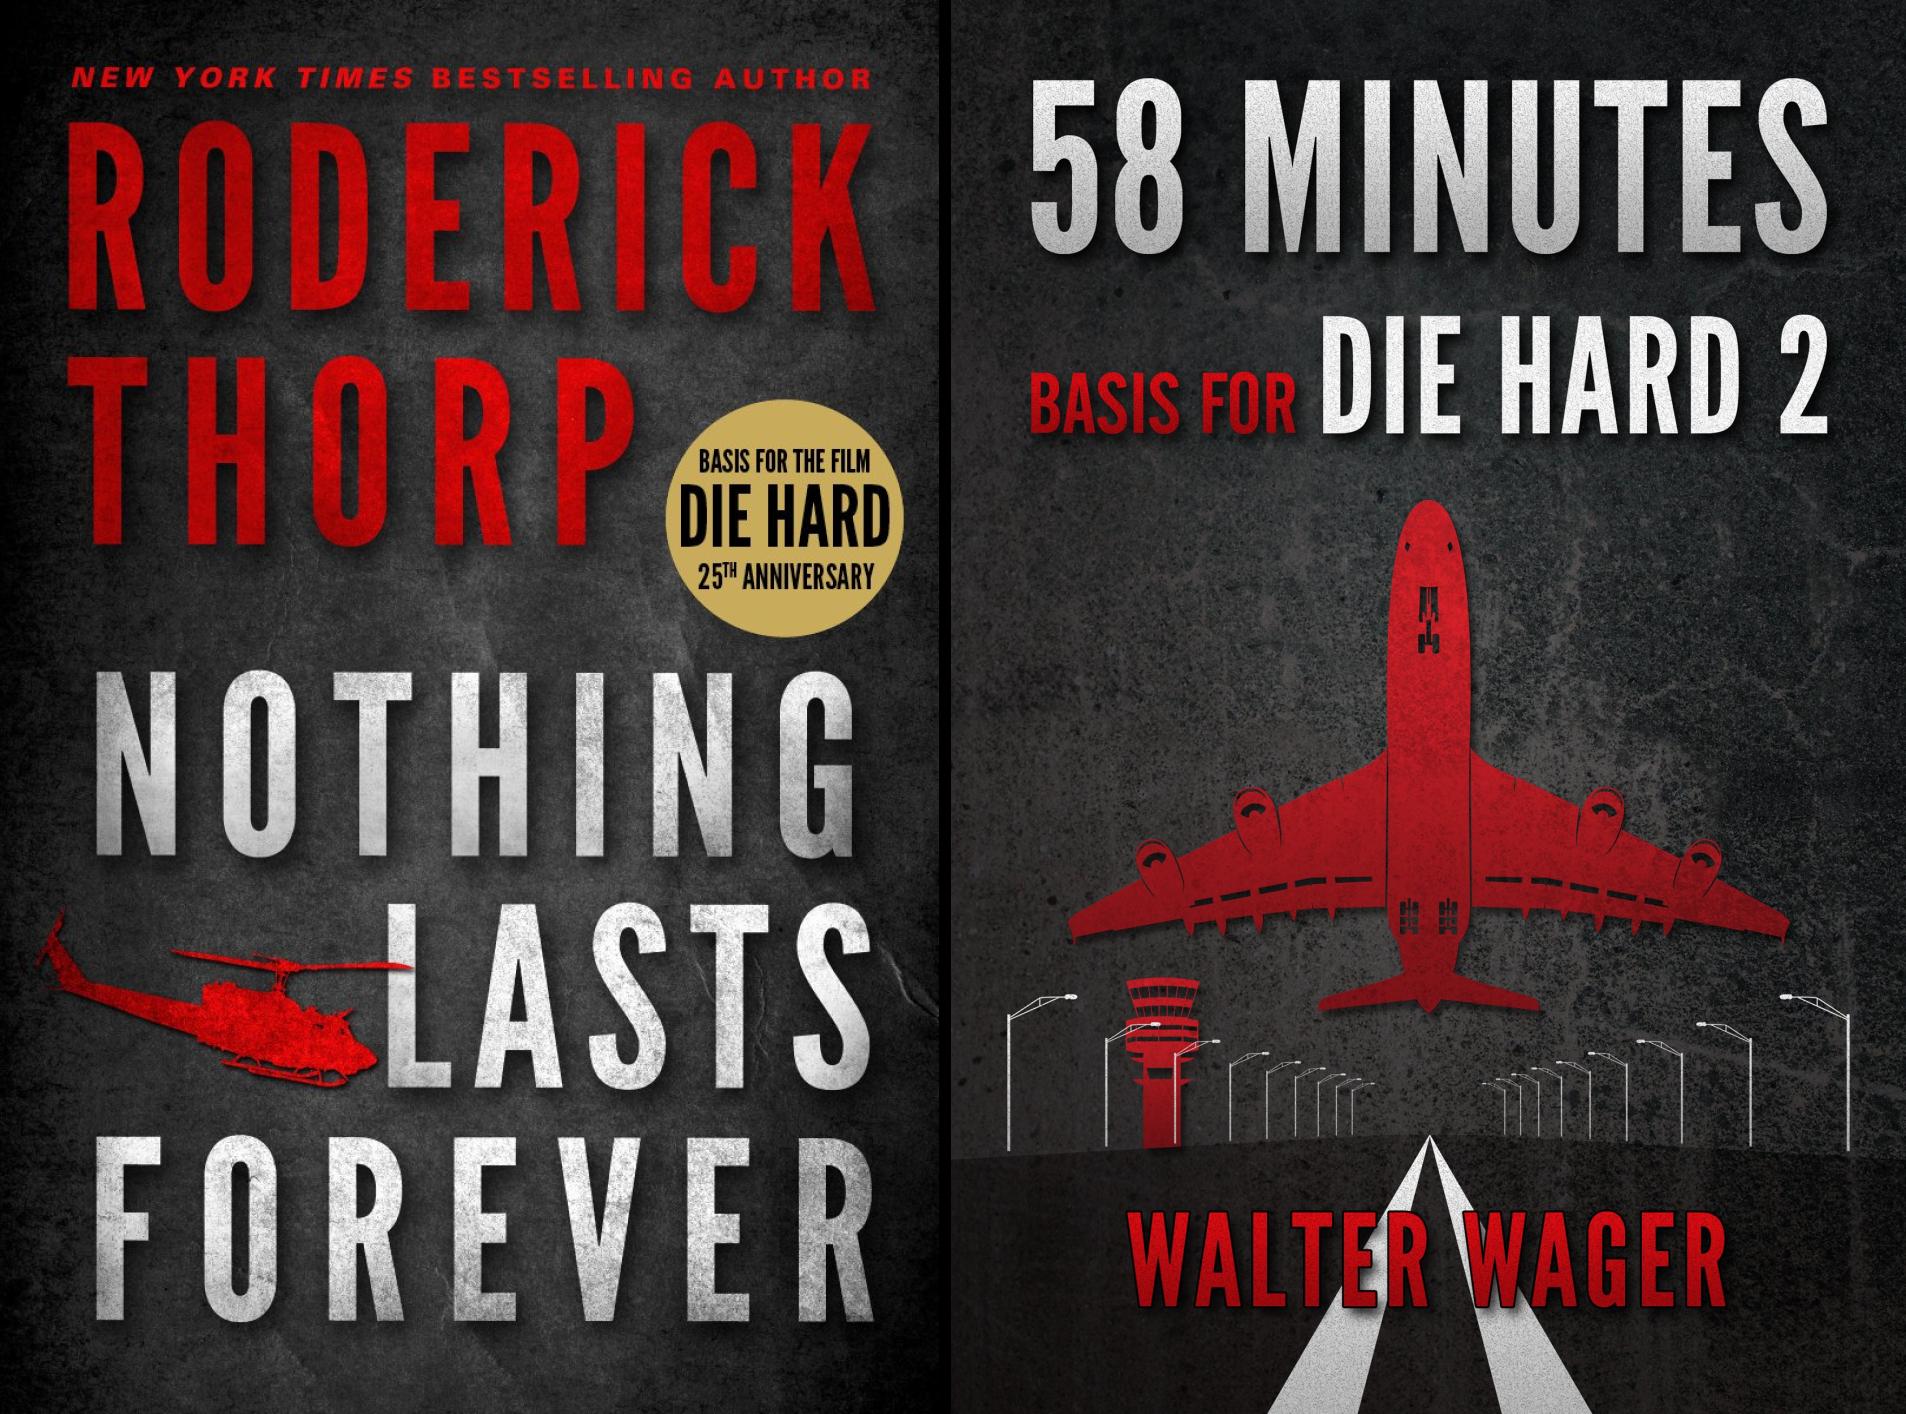 Basis for the Film Die Hard (2 Book Series)